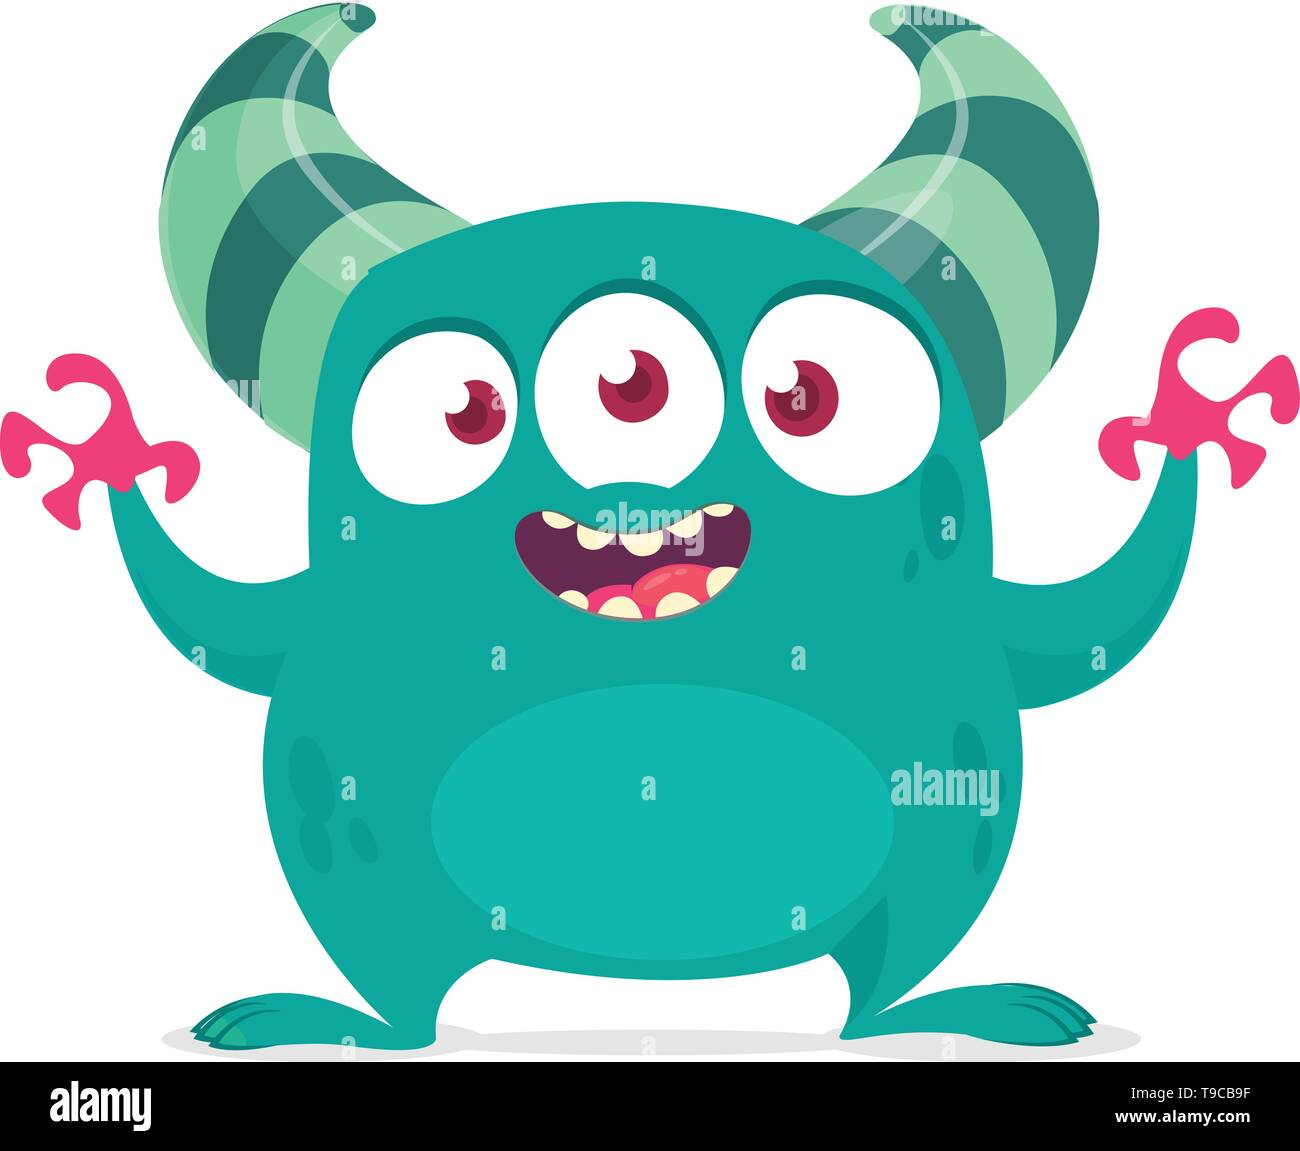 Funny Cartoon Alien With Three Eyes Vector Illustration Clipart Stock Vector Image Art Alamy